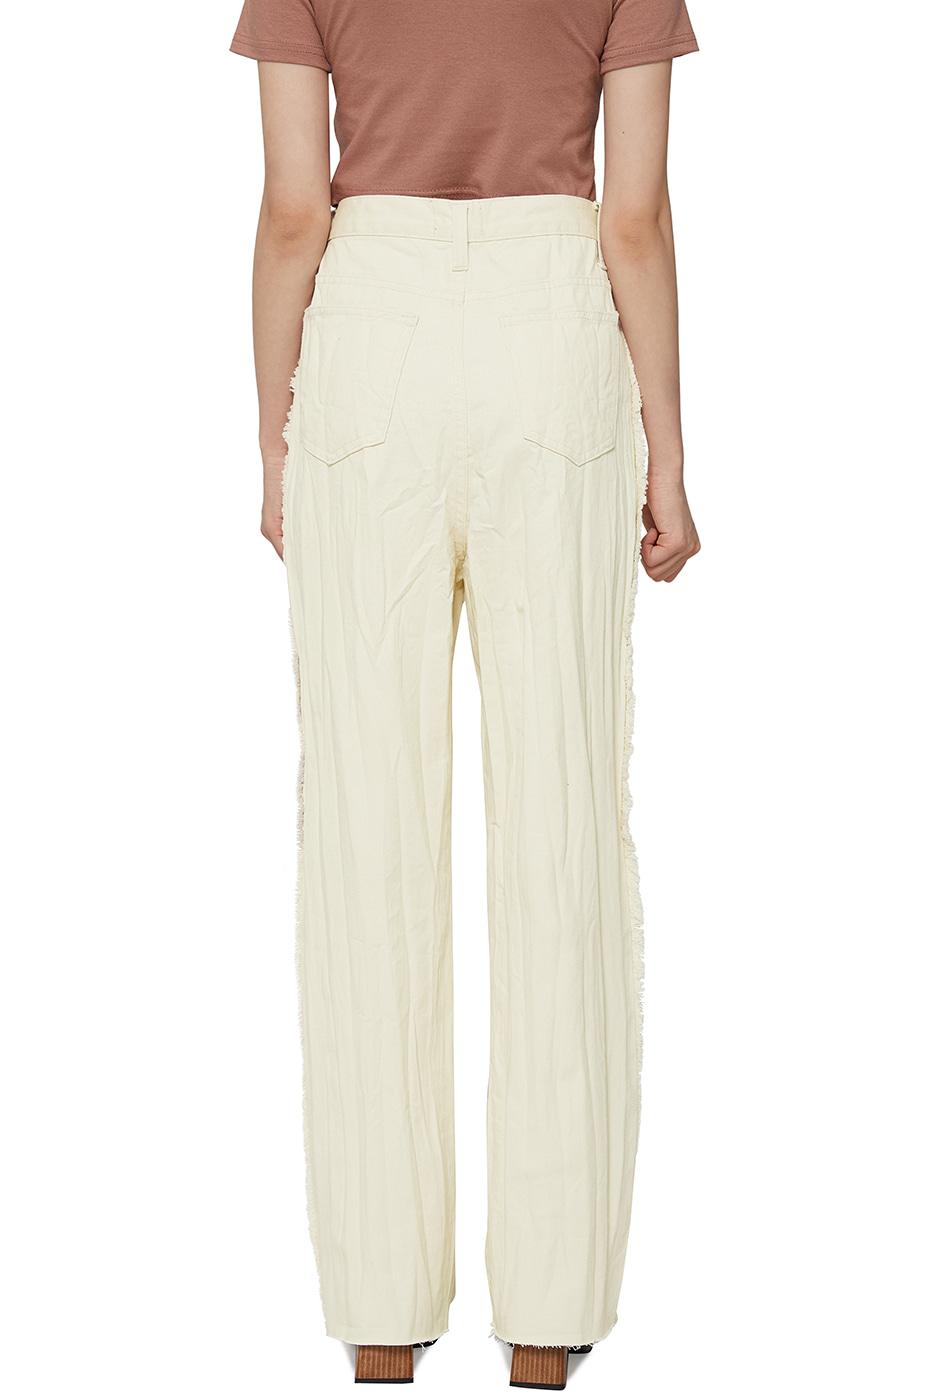 Fringed wrinkled straight jeans